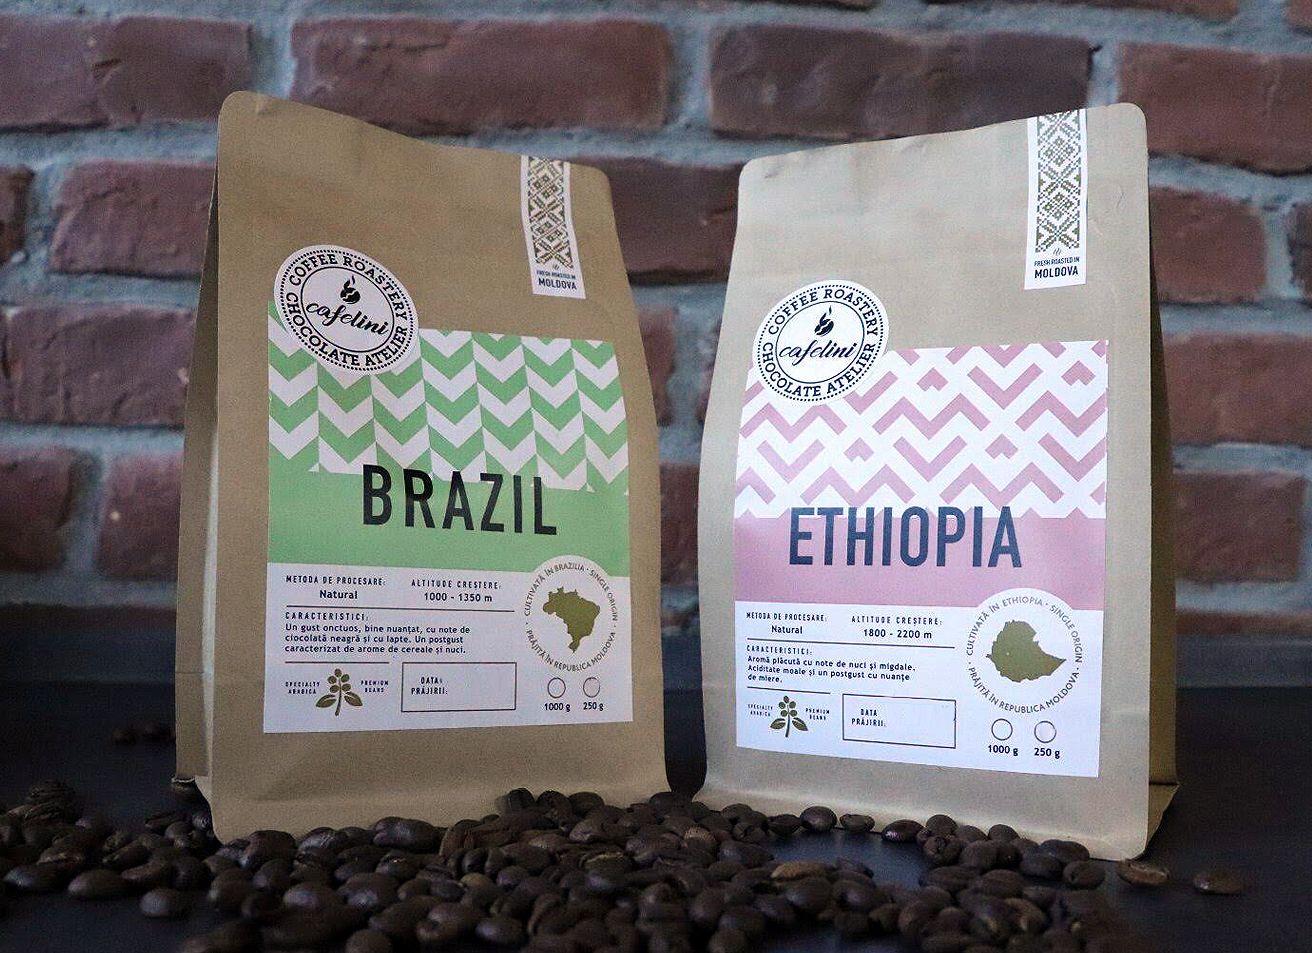 Cafelini Coffee Beans Packaging Design by Brand Look in